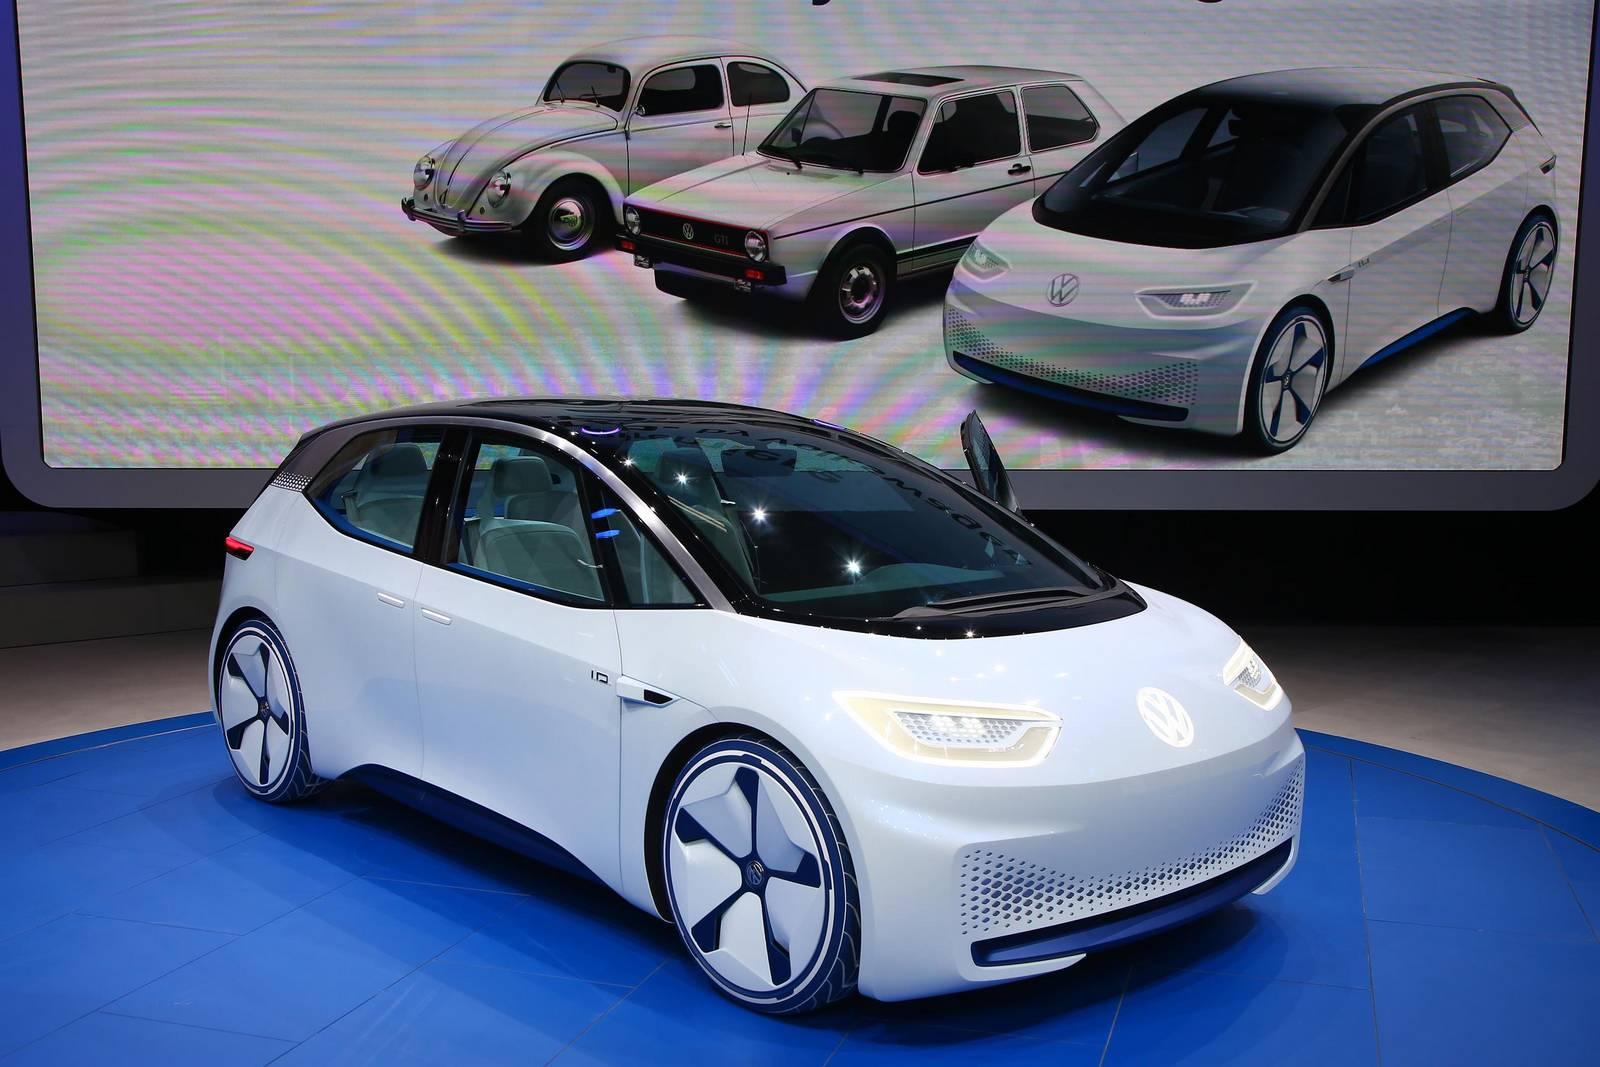 paris 2016 volkswagen i d electric concept car gtspirit. Black Bedroom Furniture Sets. Home Design Ideas